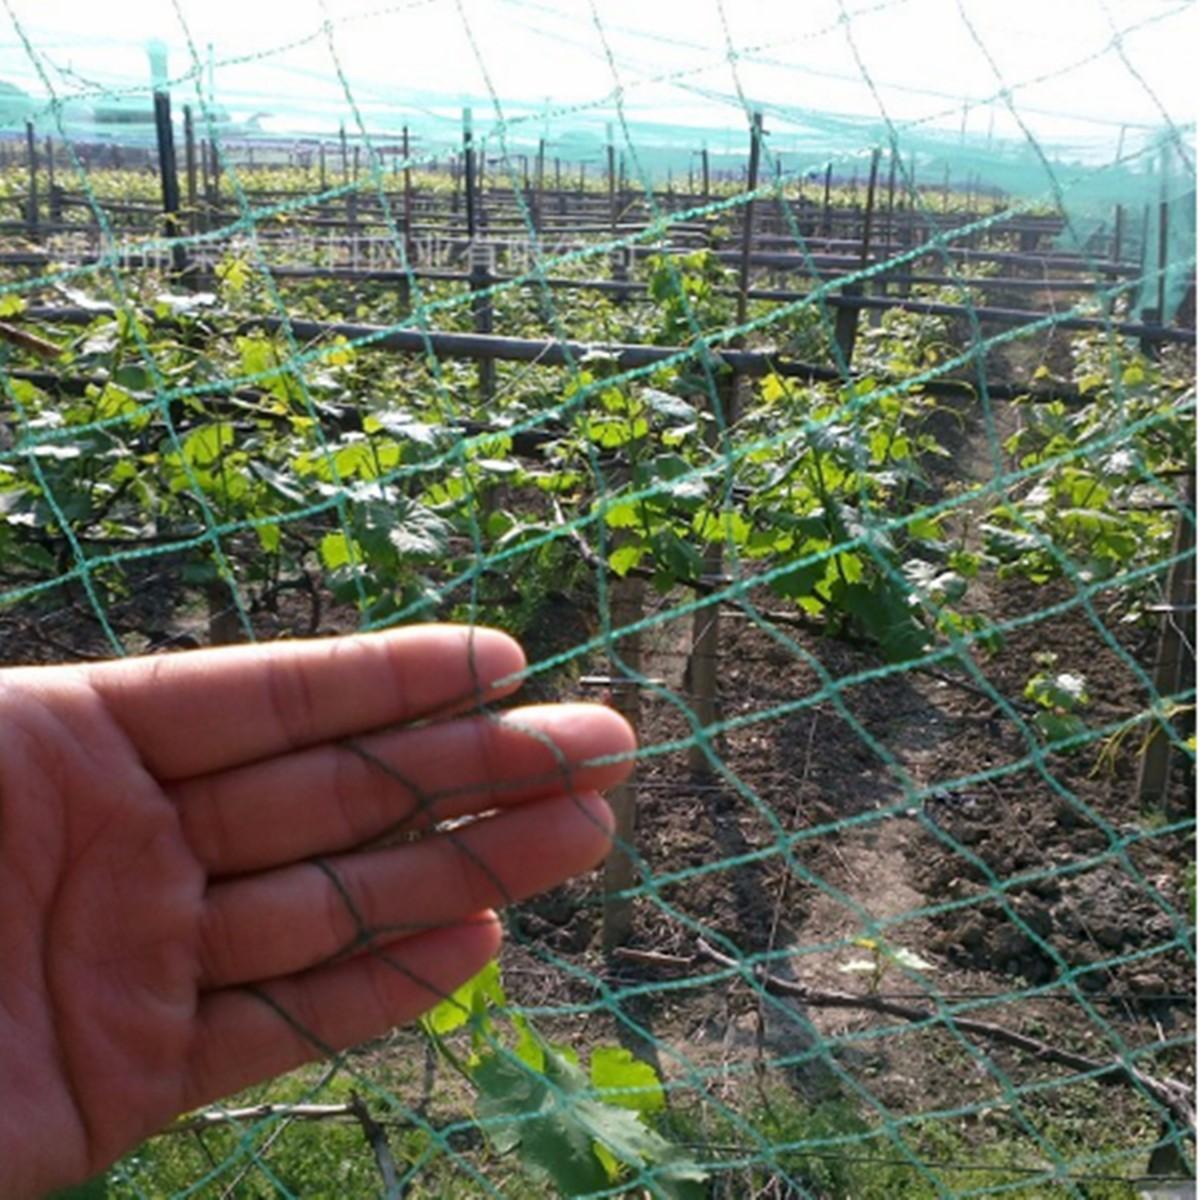 4m wide anti bird netting heavy duty superior mesh net for for Garden pool netting